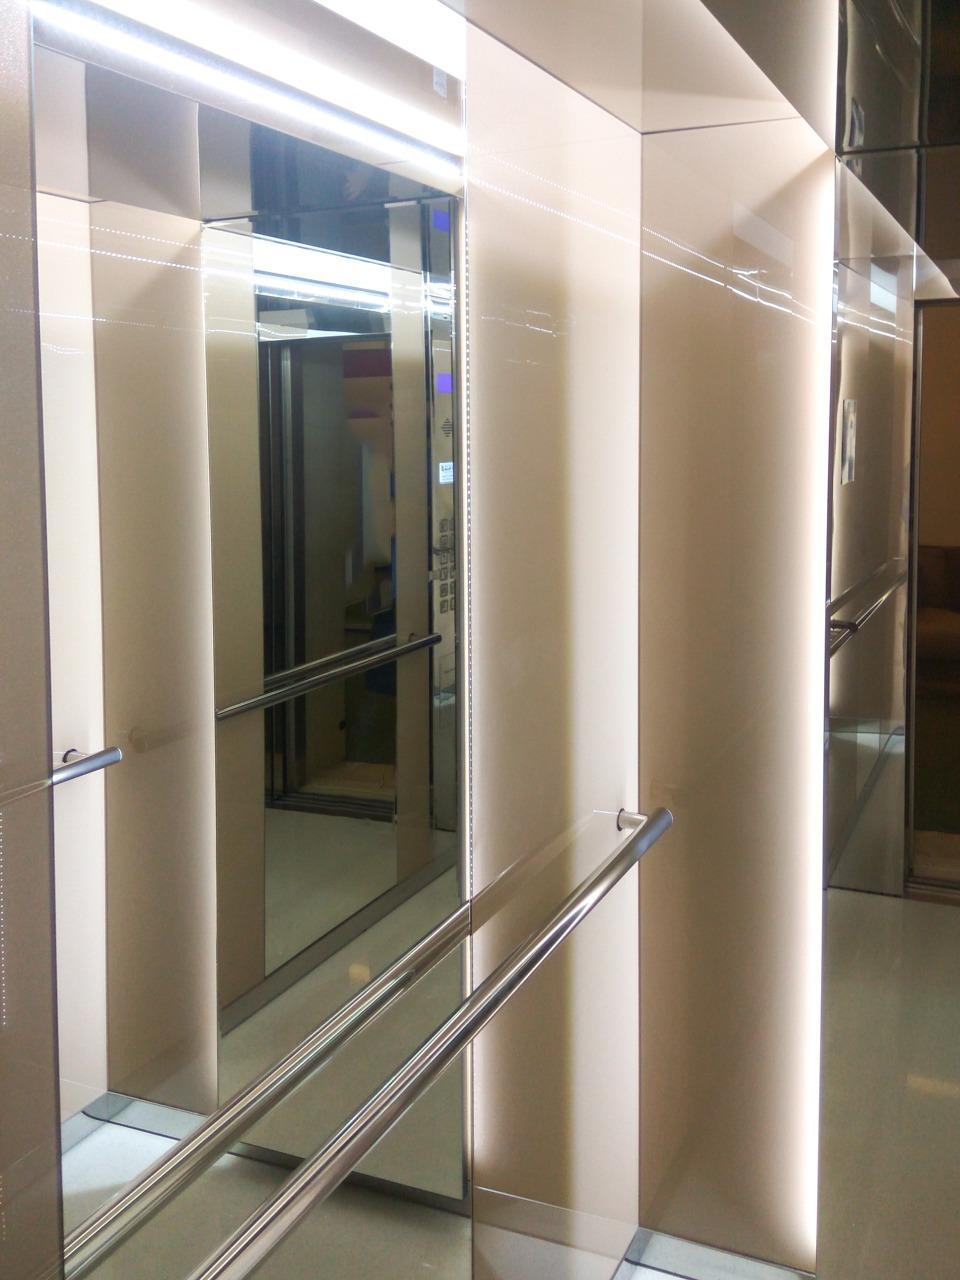 zlift-erga-lifts-48 Εγκατάσταση Ανελκυστήρα - Ρόδος